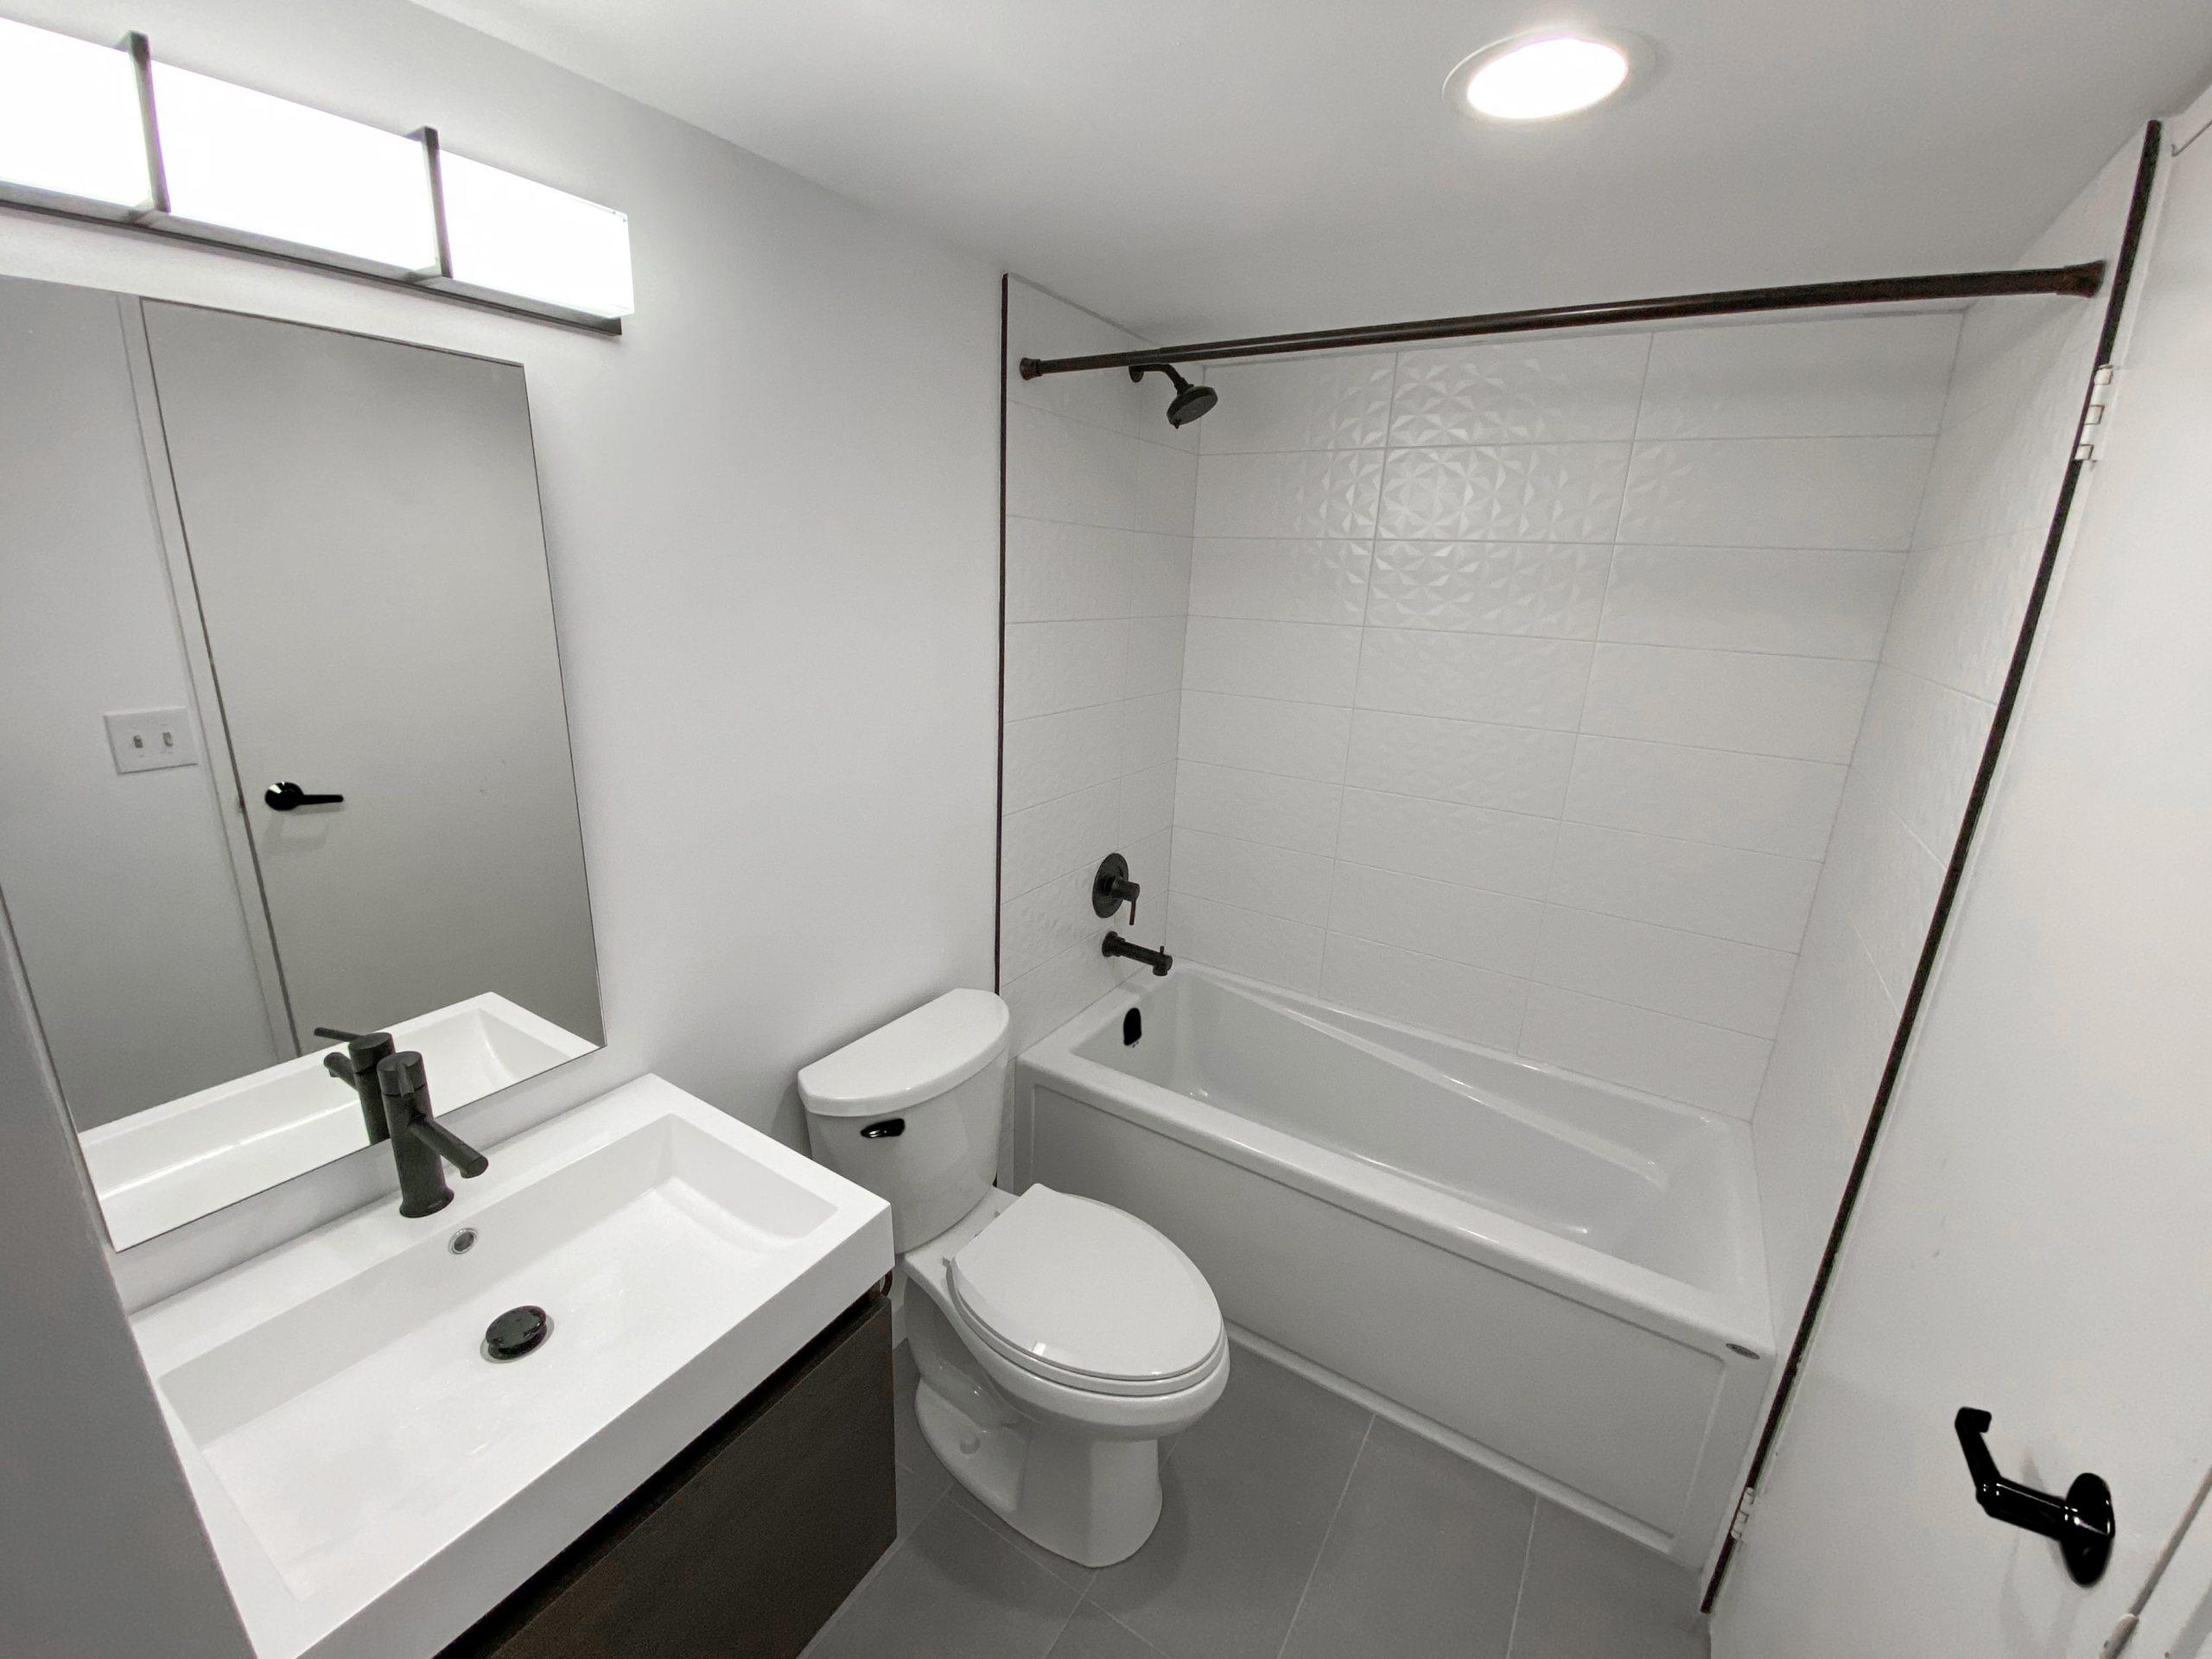 Richmond St. W. – Main Condo Bathroom - Featured Image